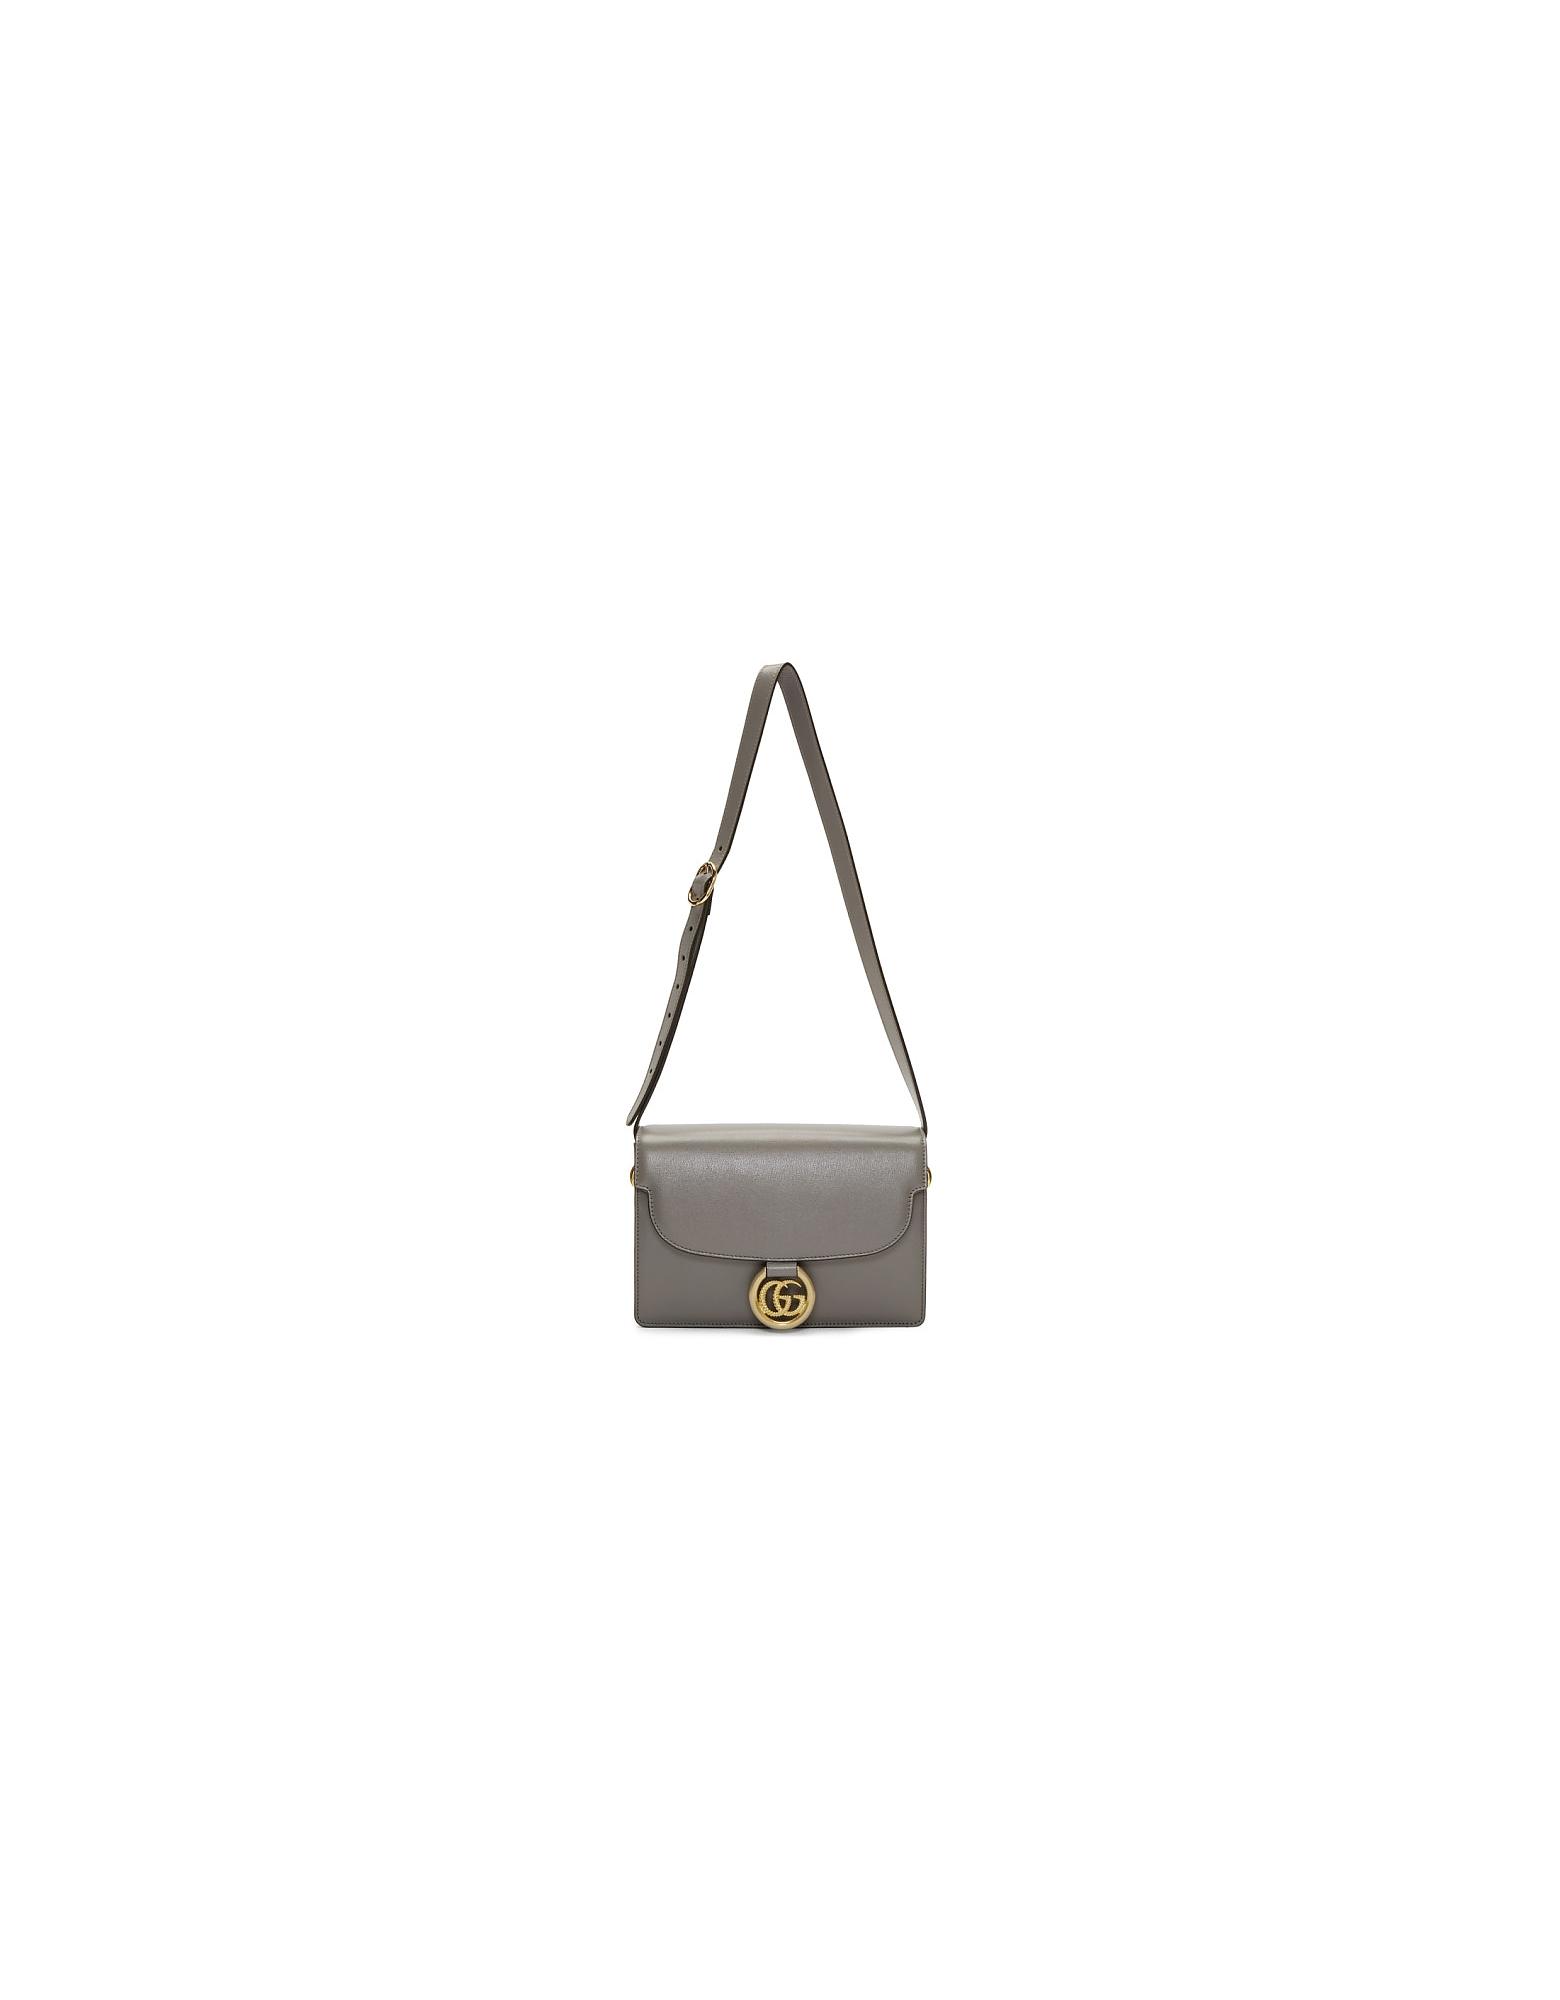 Gucci Designer Handbags, Grey Small GG Ring Shoulder Bag